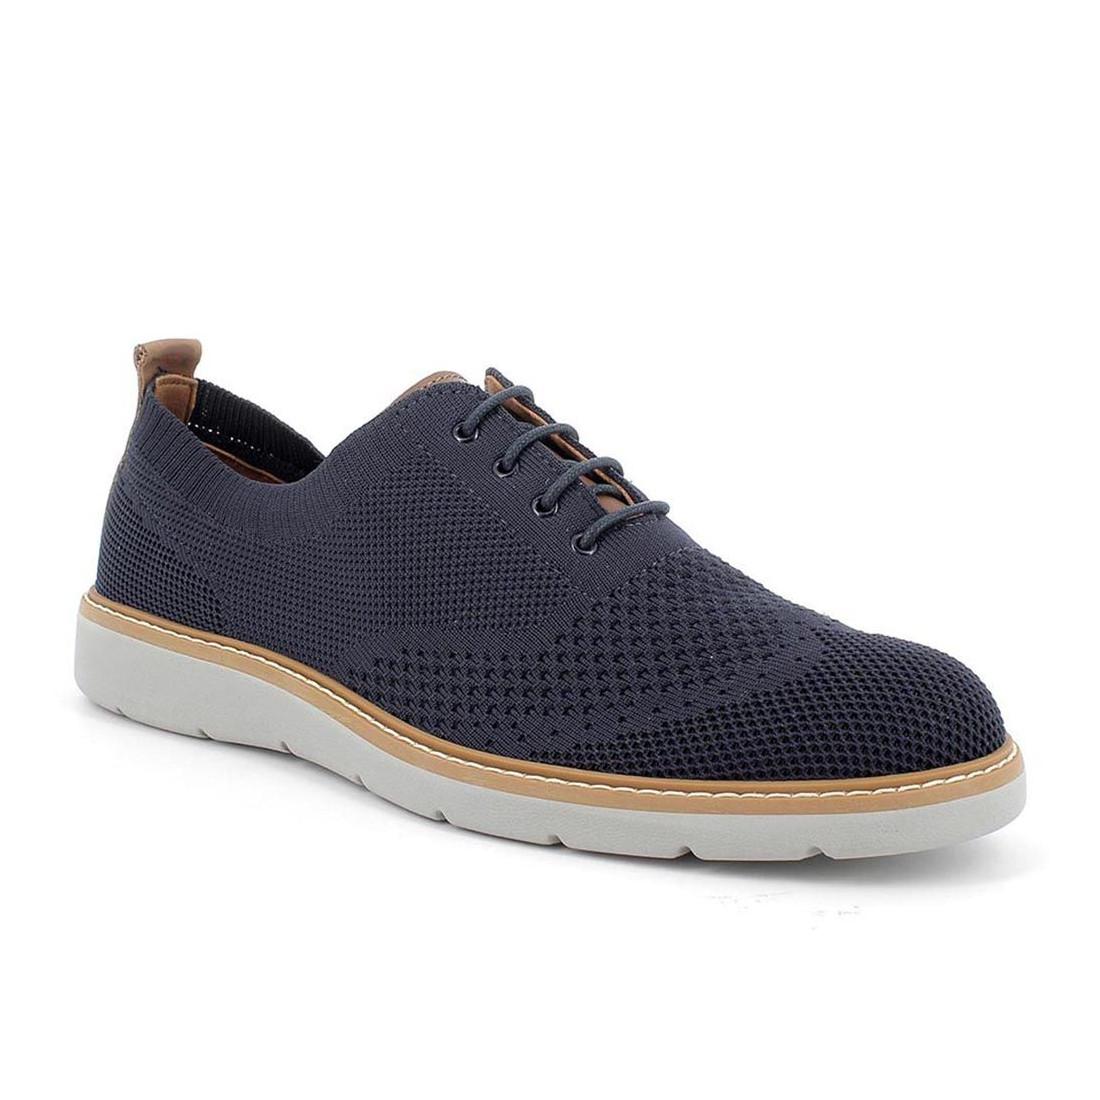 sneakers man igico carter7113111 8510